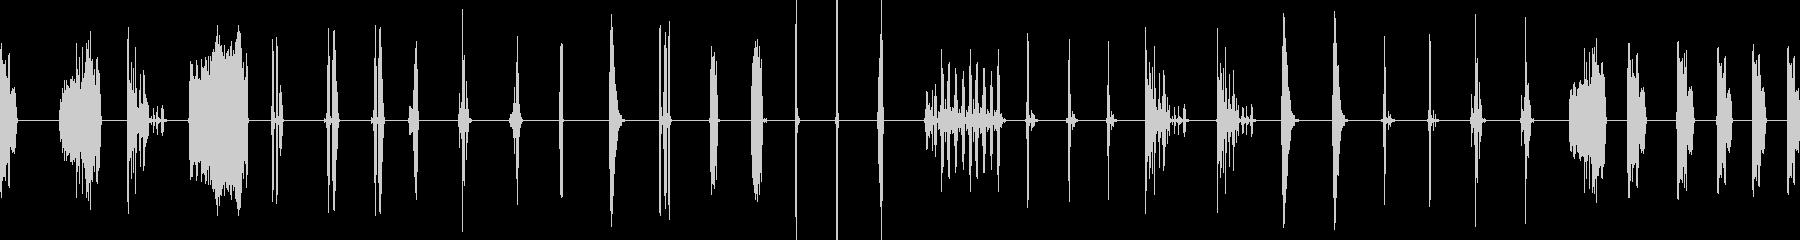 Squishy Gooeyコメディ効果の未再生の波形